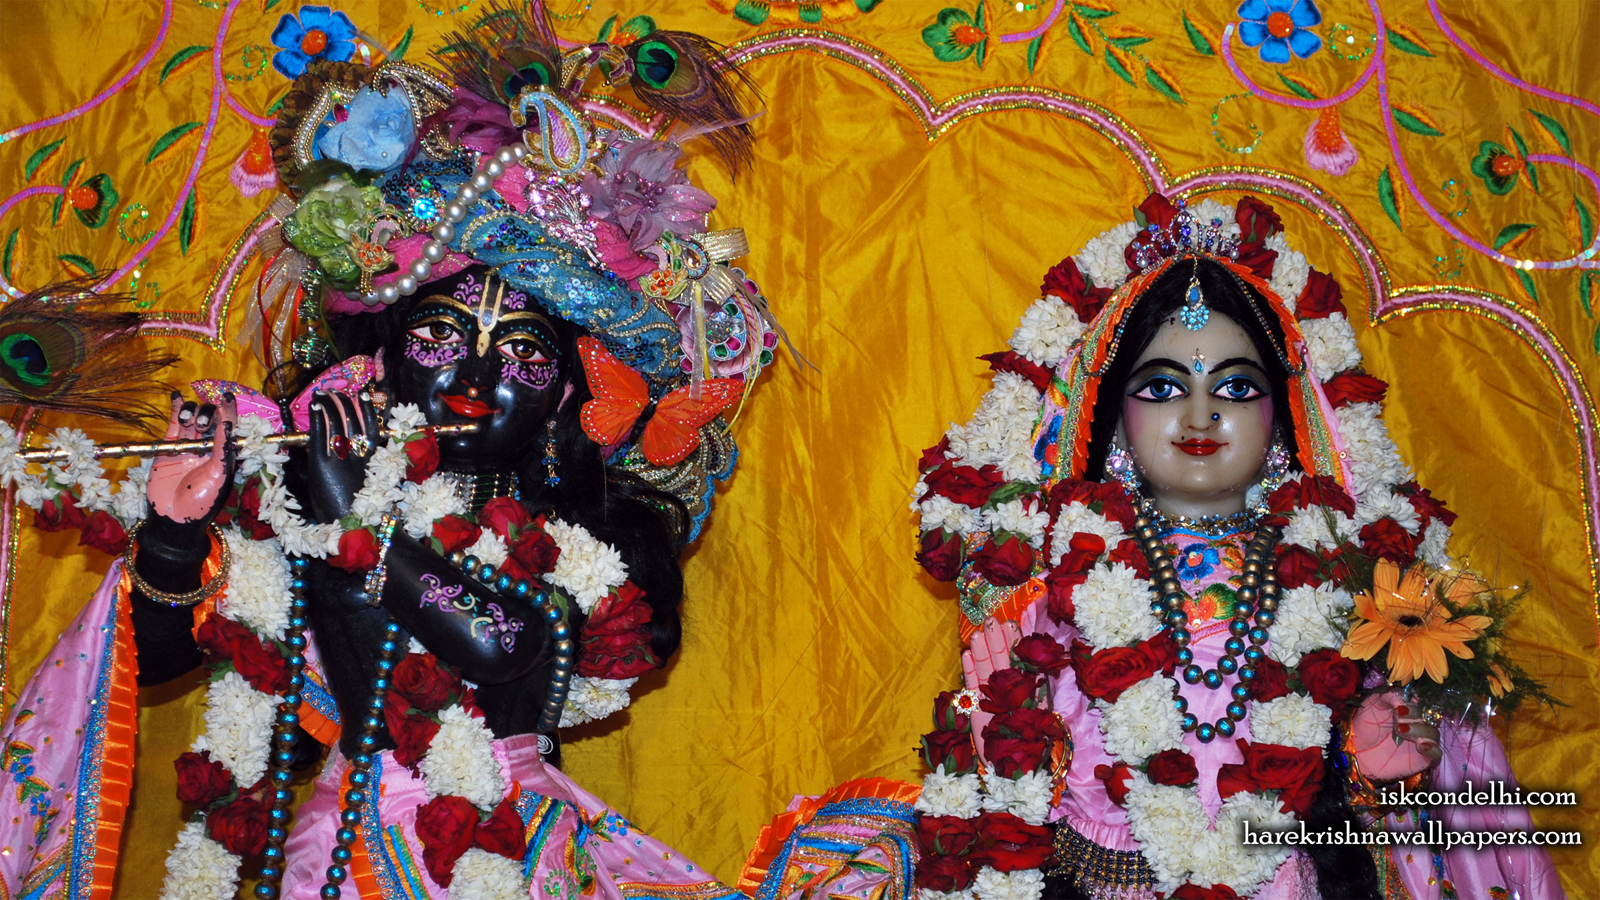 Sri Sri Radha Parthasarathi Close up Wallpaper (013) Size 1600x900 Download